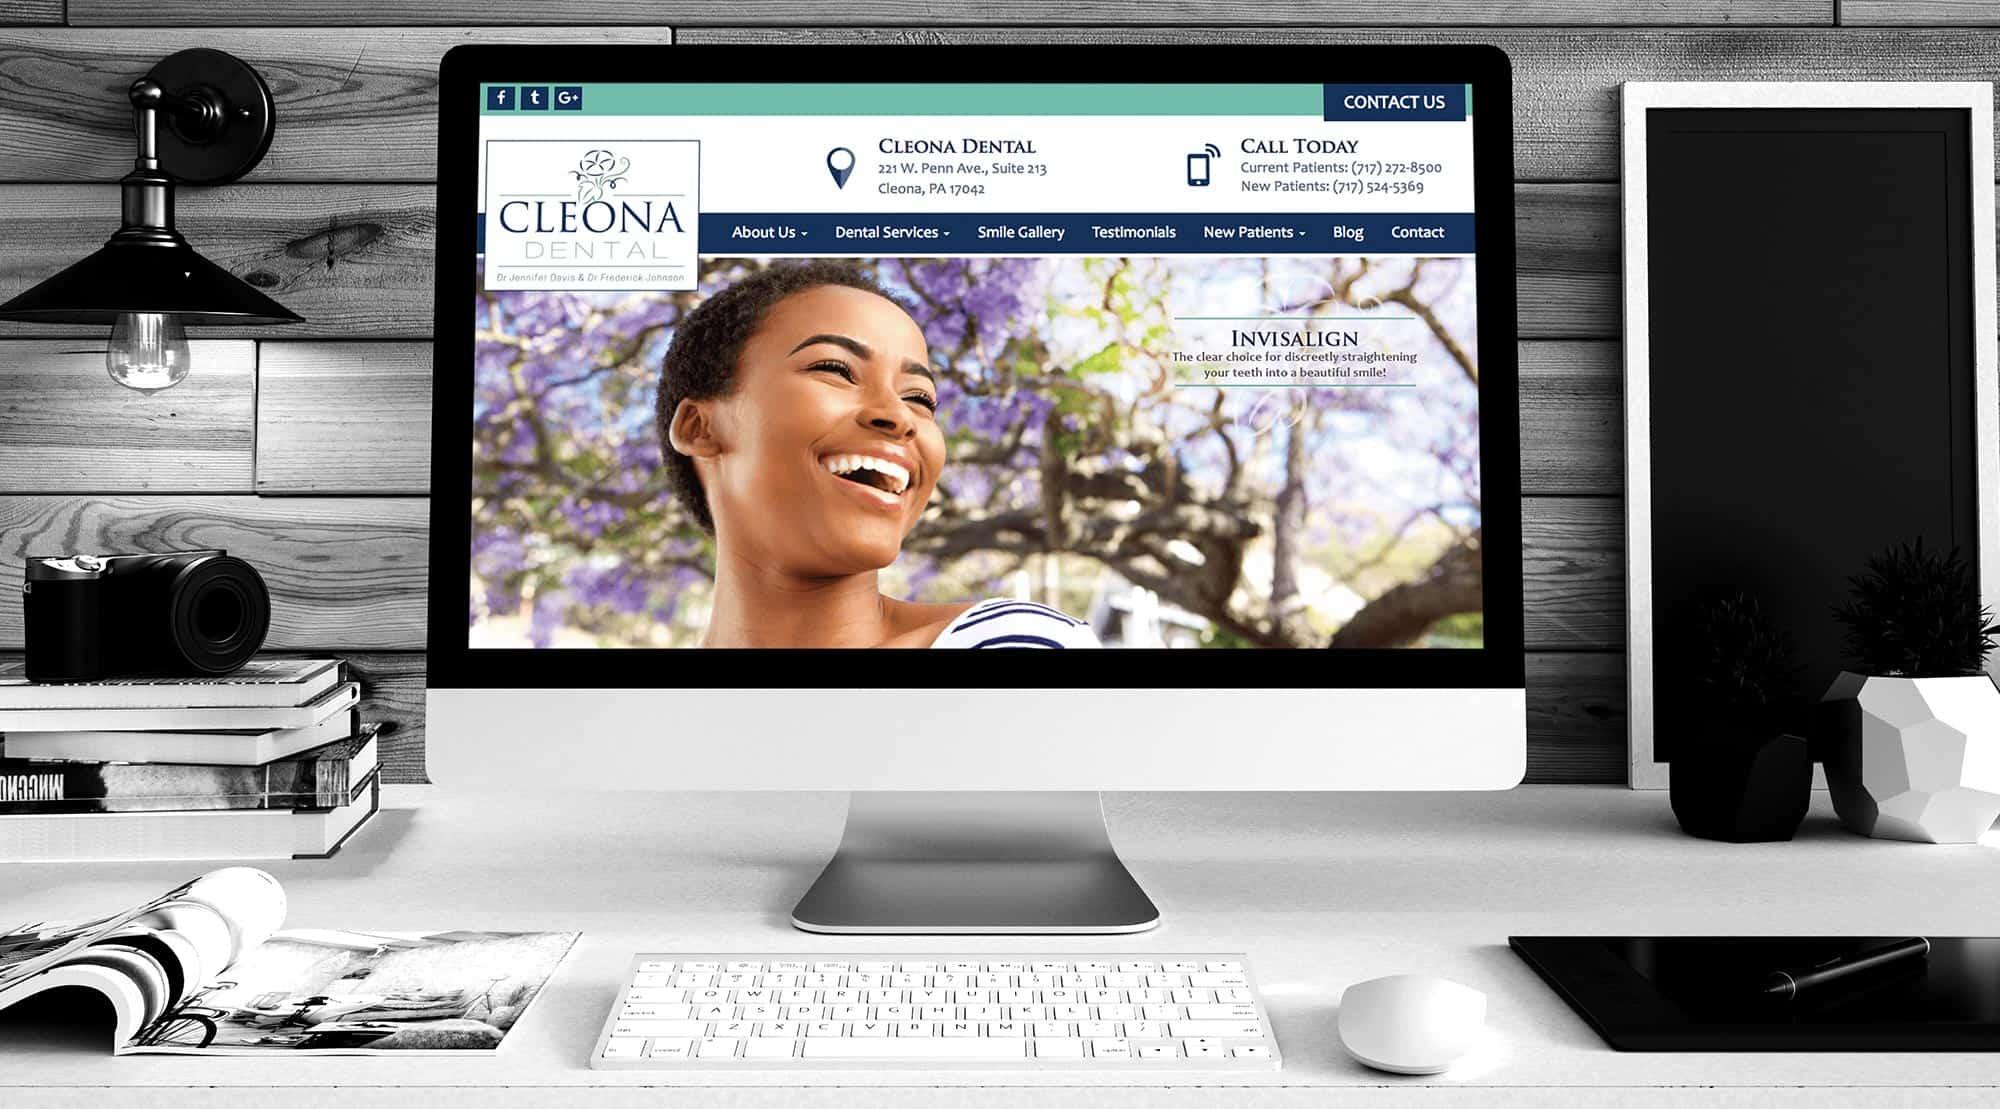 dental website example cleona dental